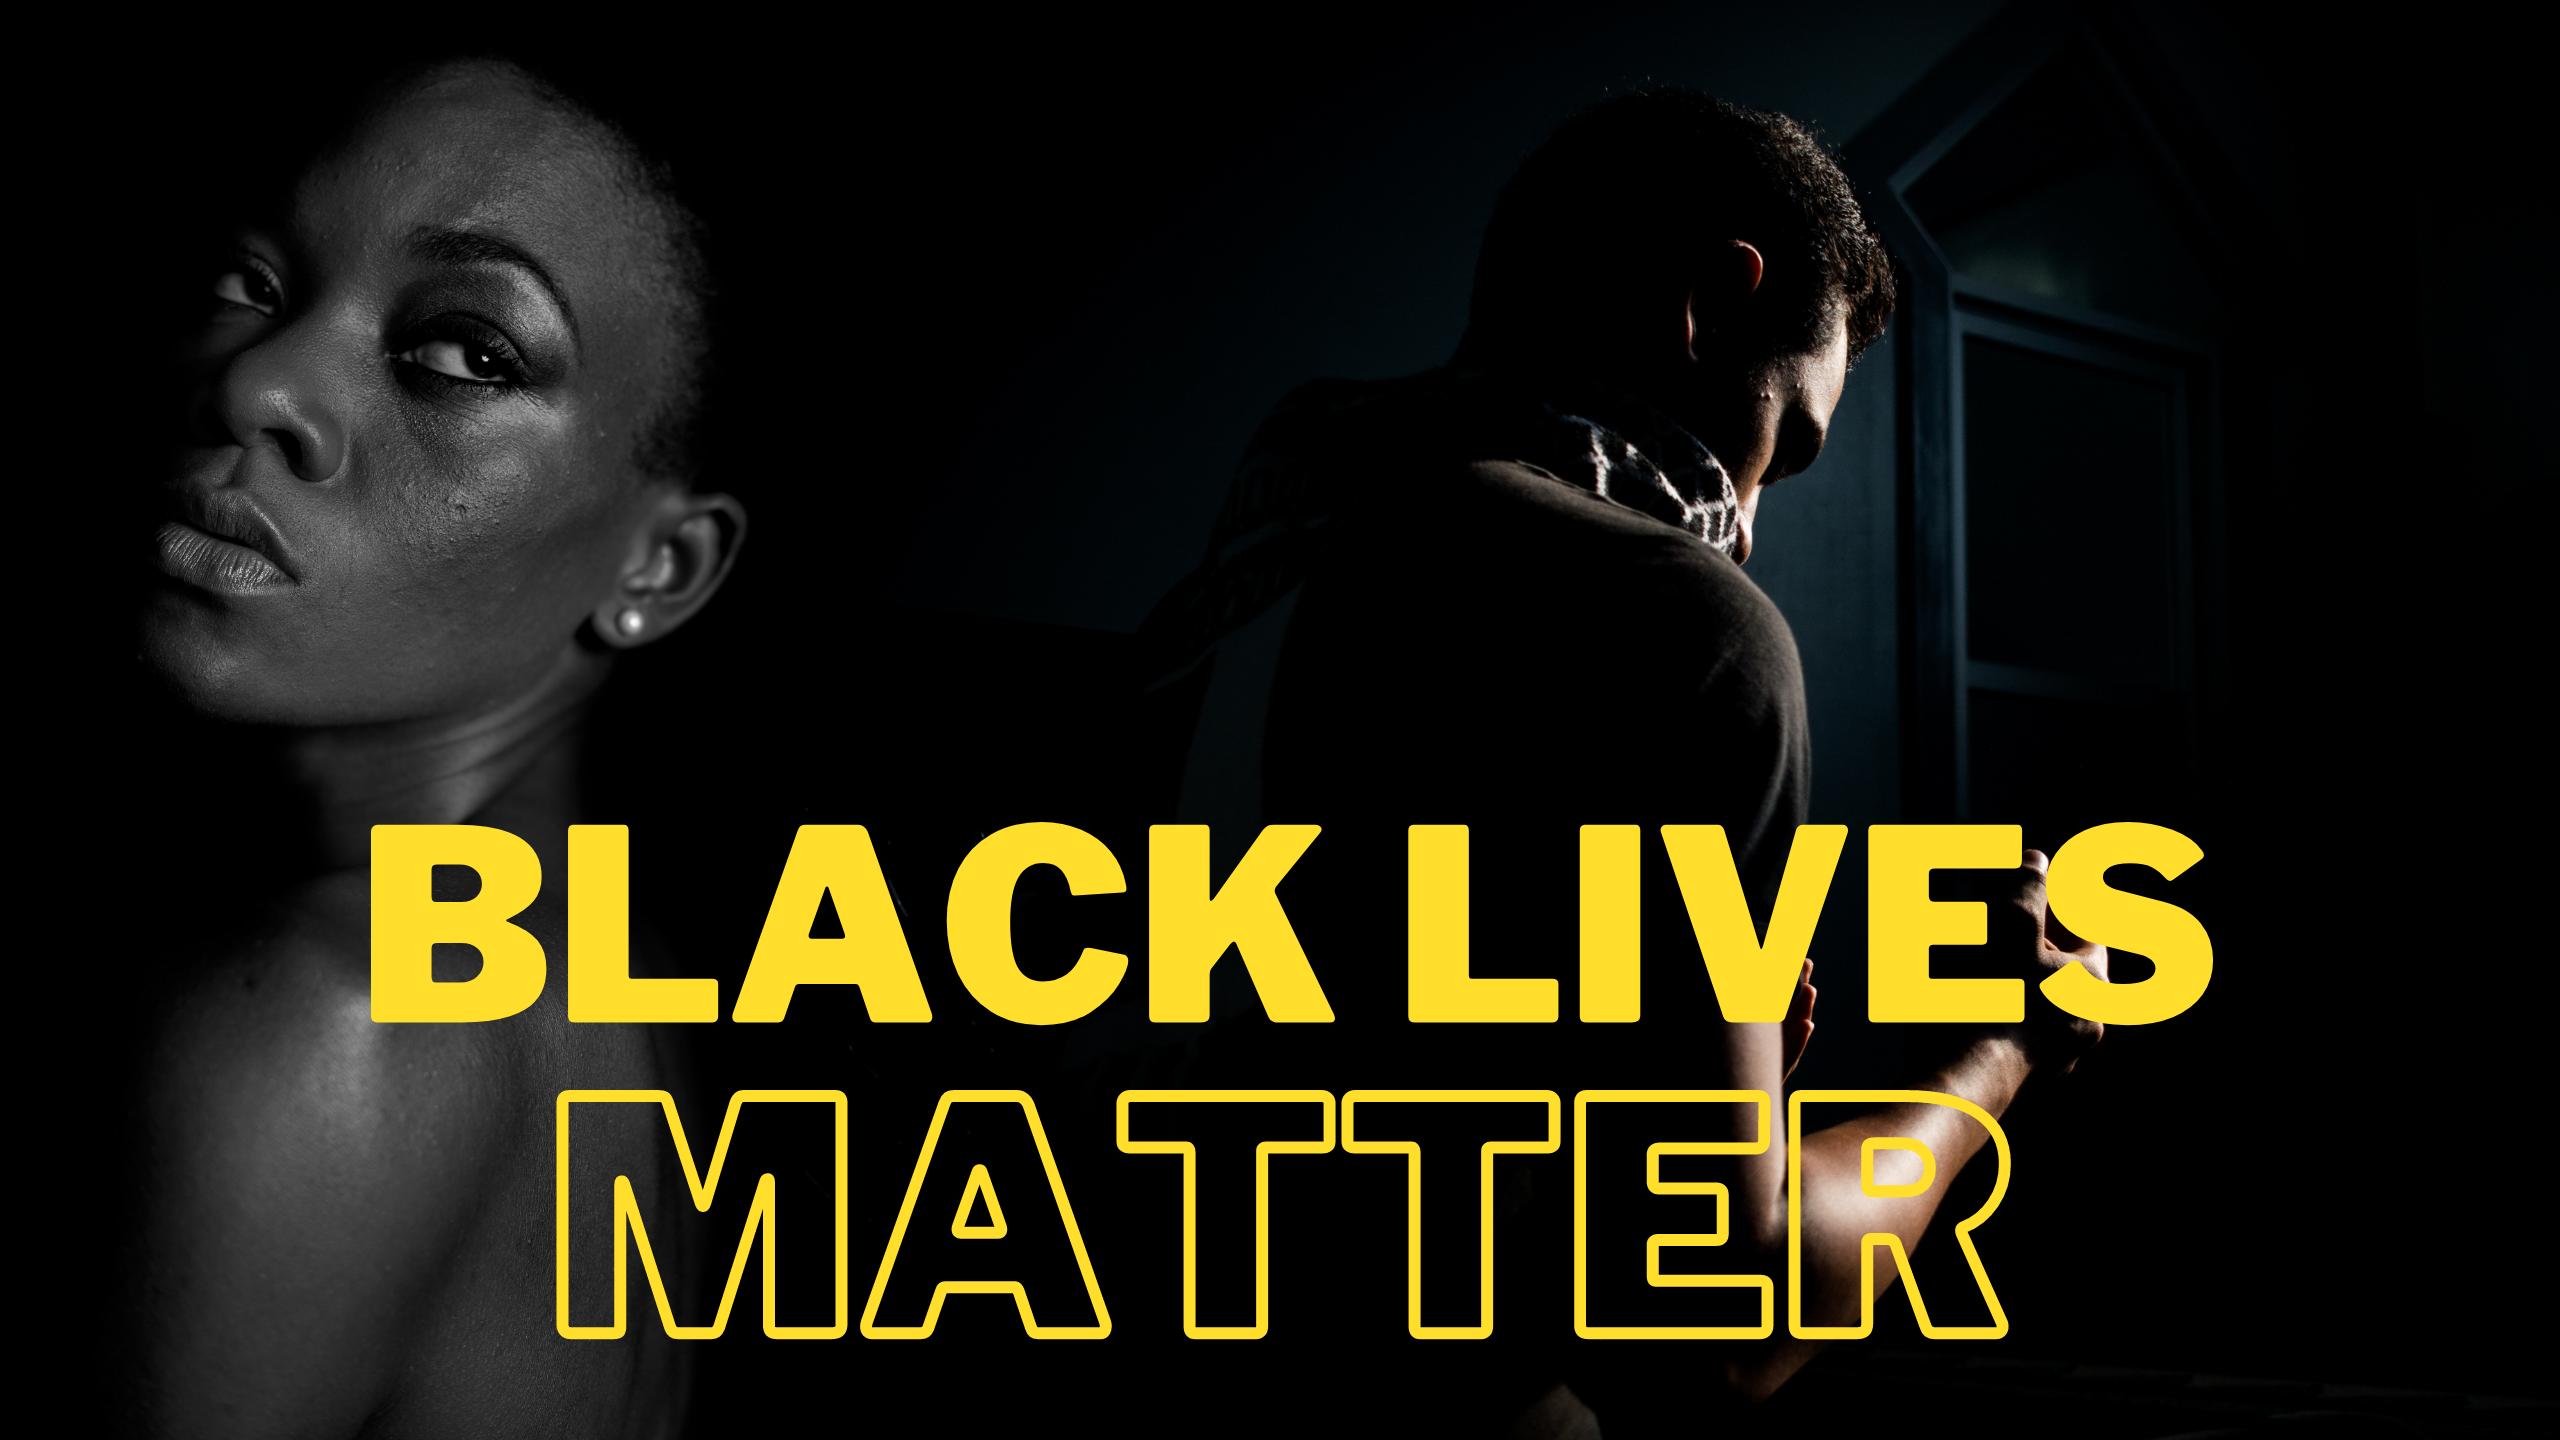 ANKORS supports black lives matter